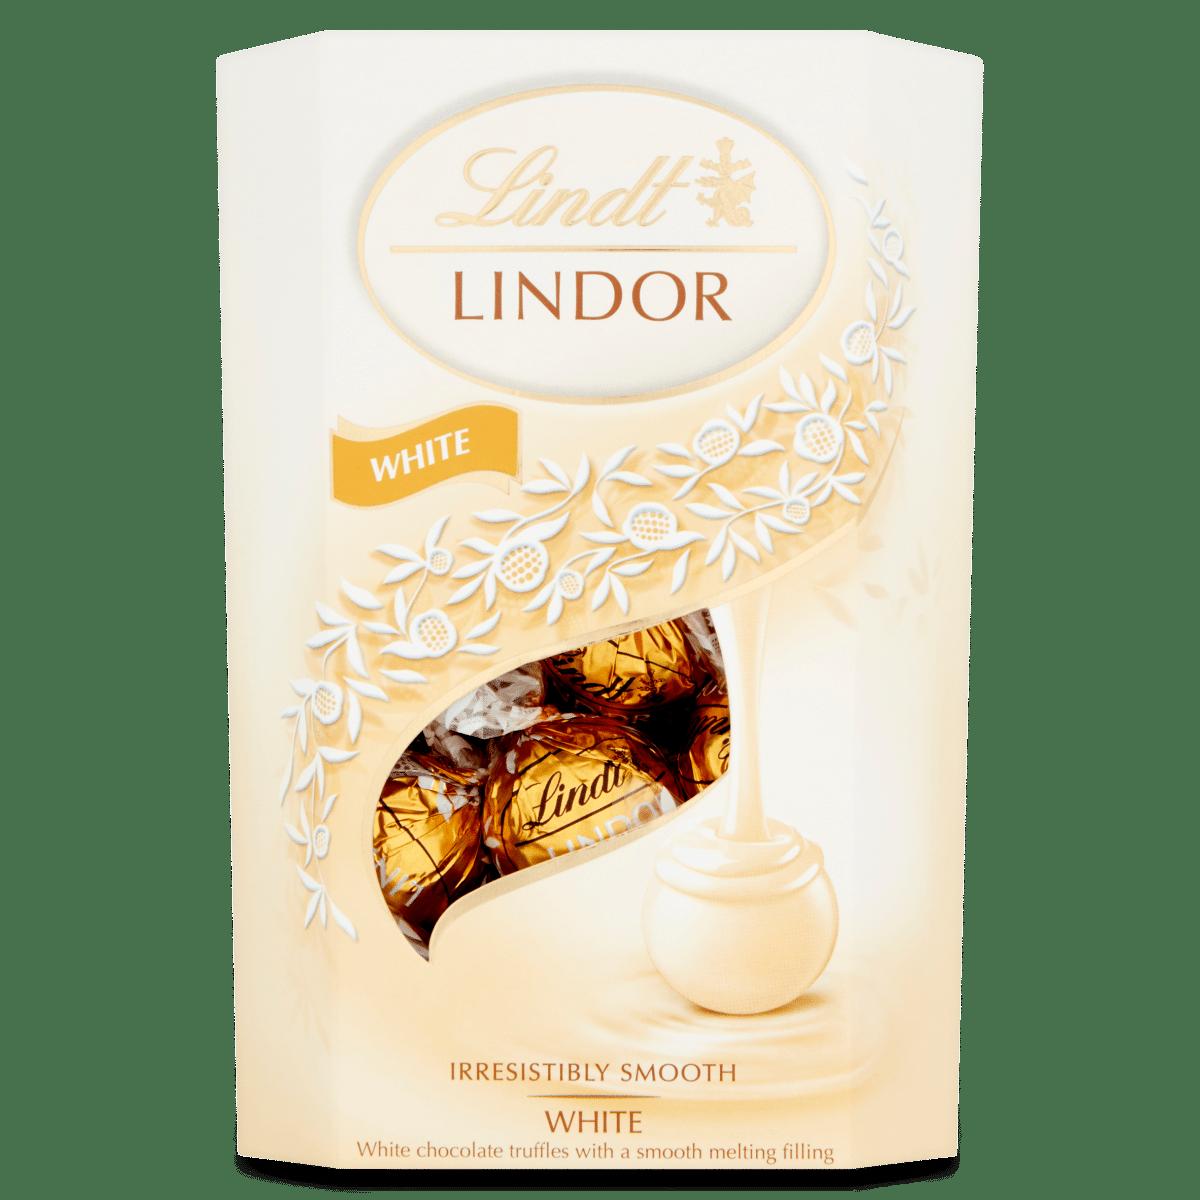 Lindt LINDOR White Chocolate Truffles 200g